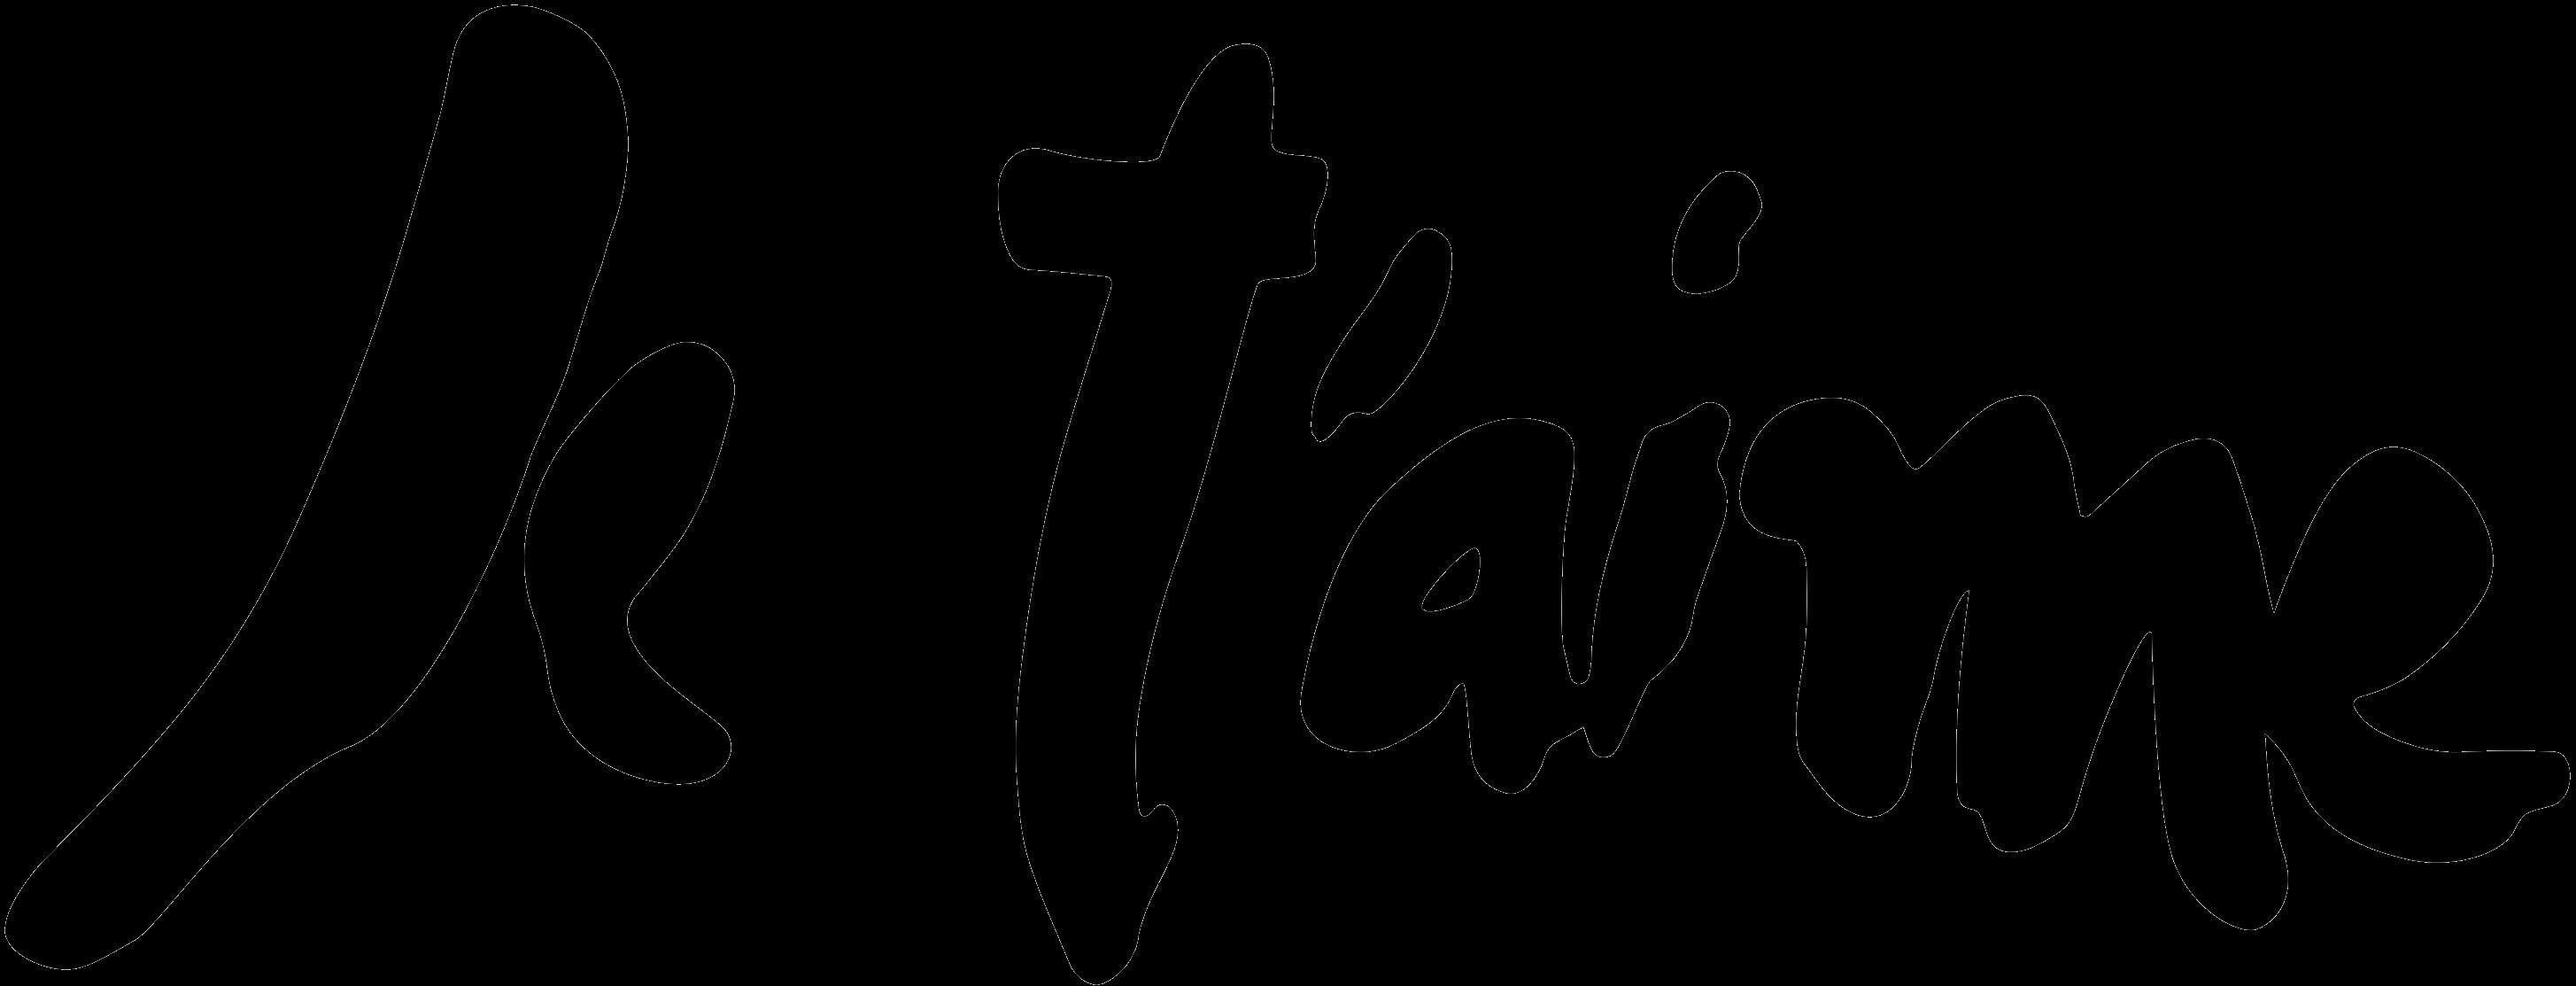 JTA_logo kopi u bag.png